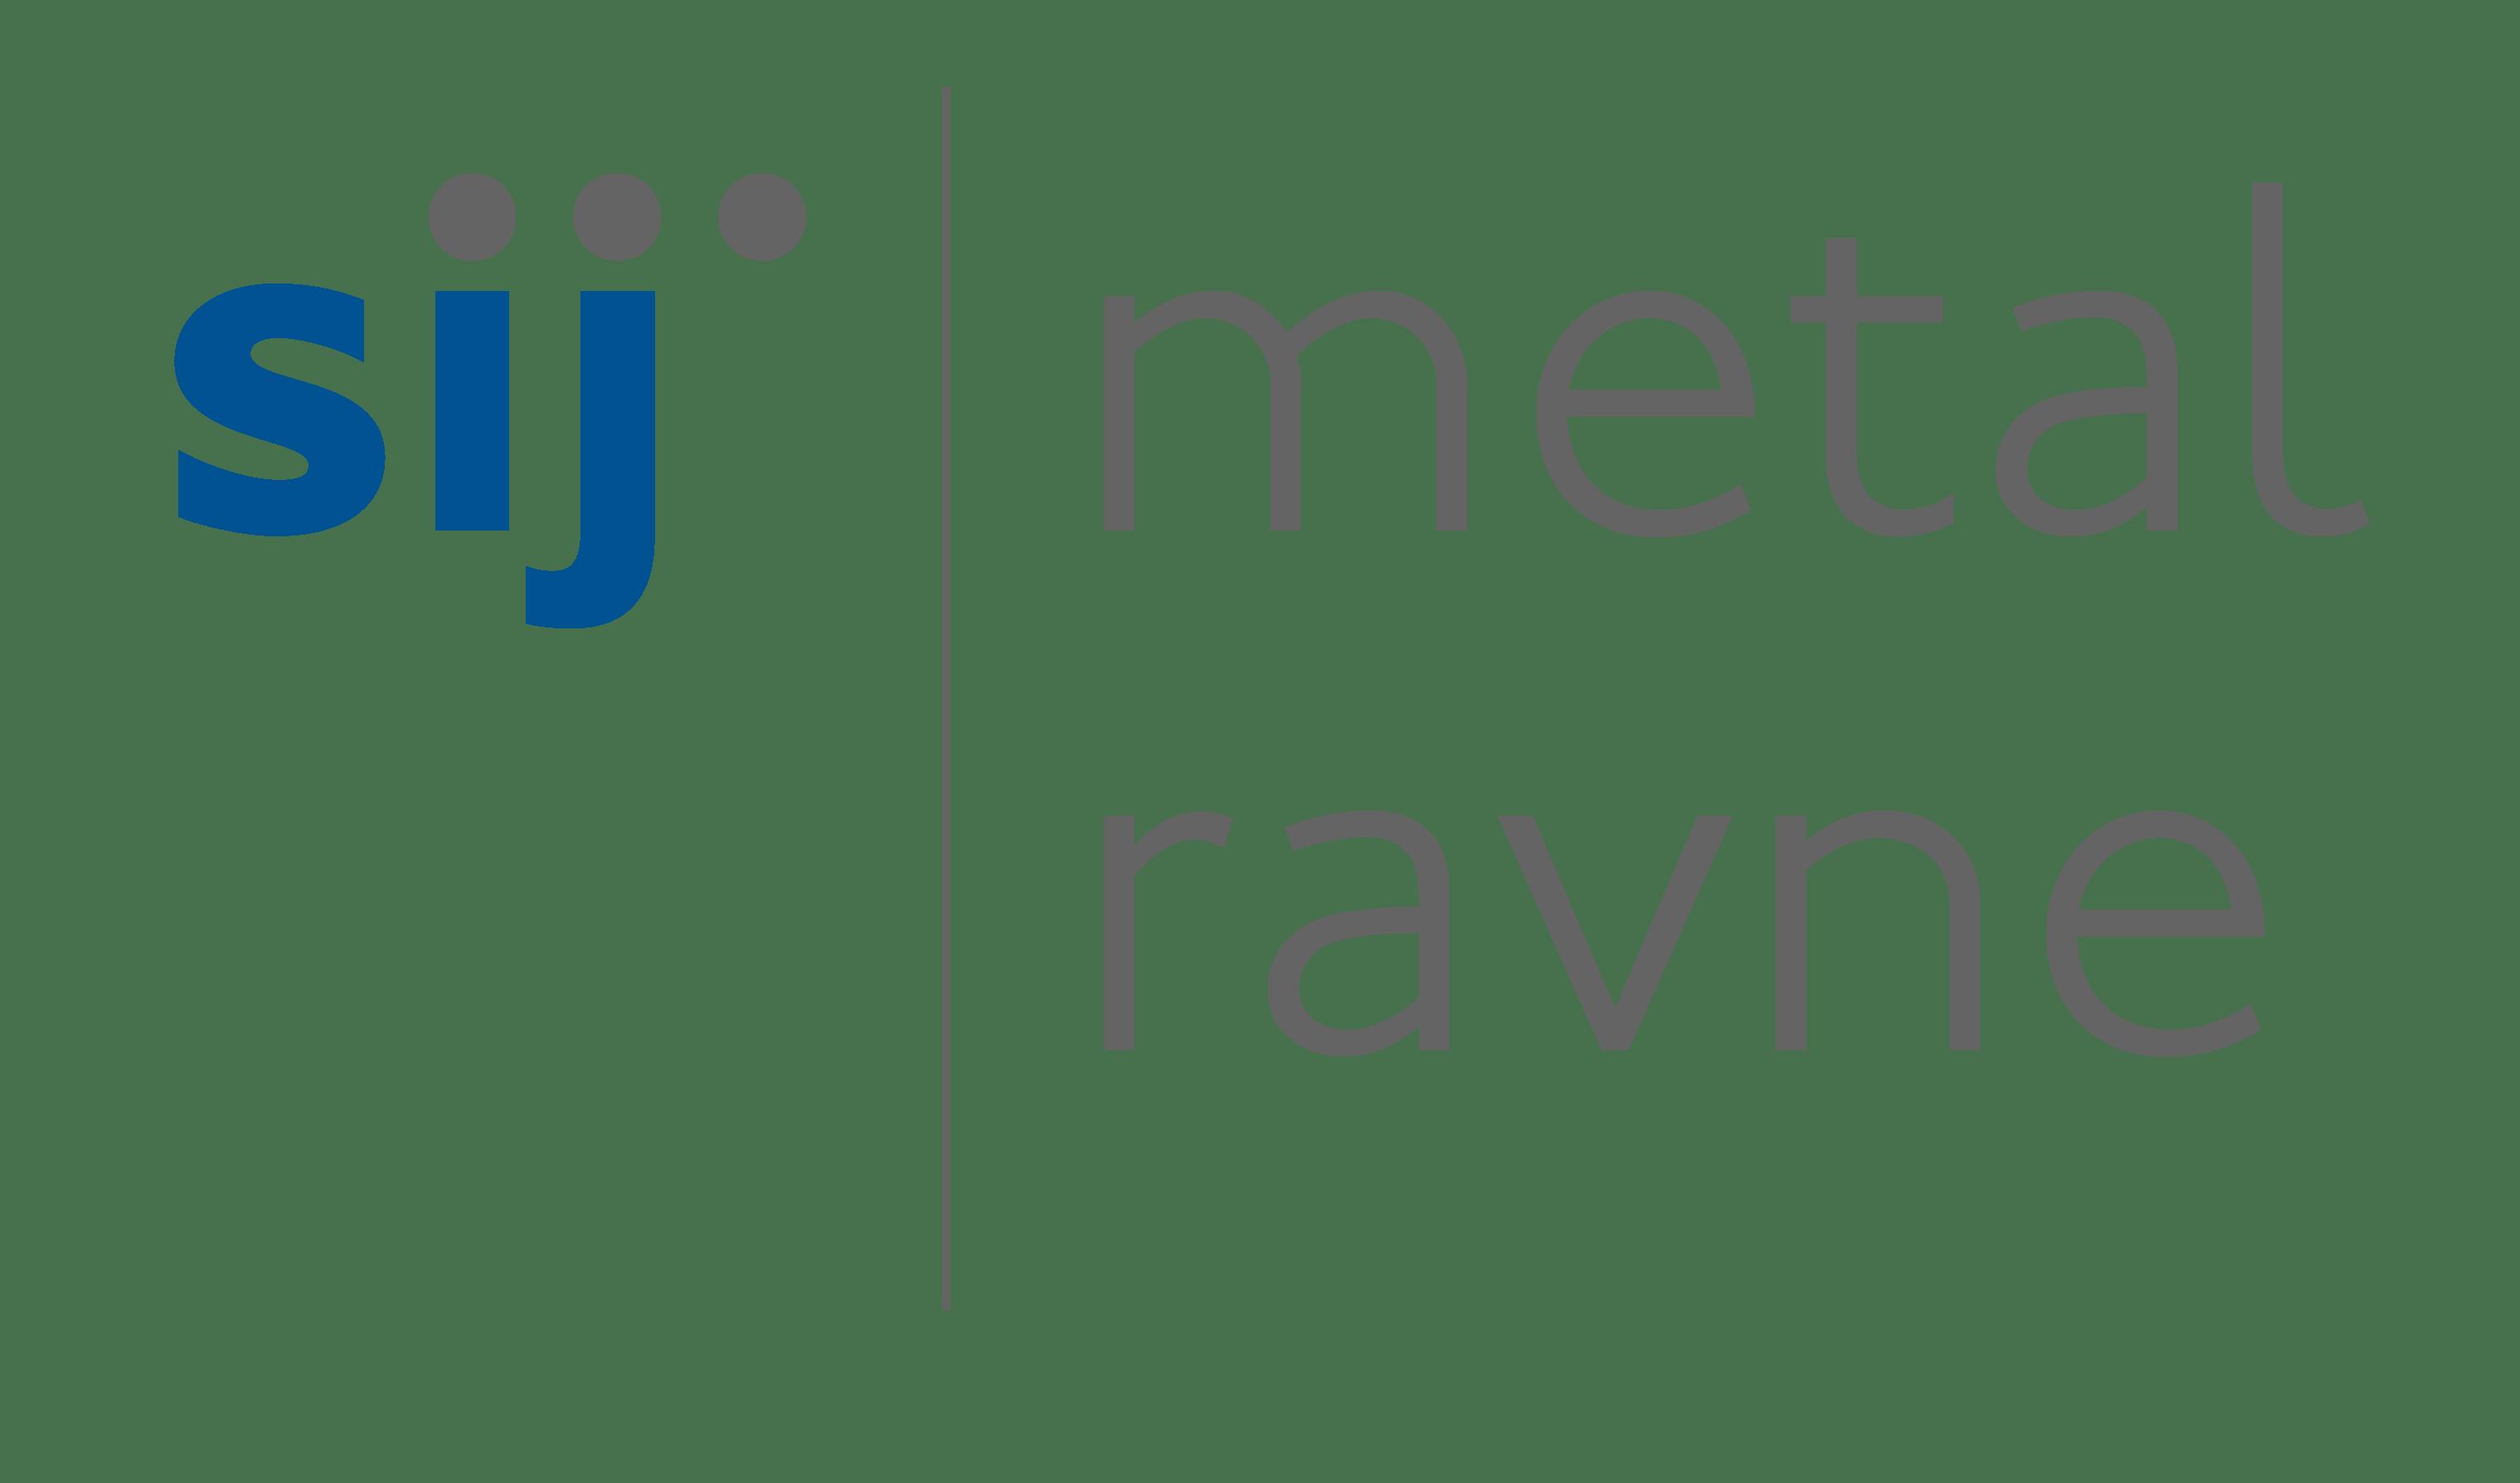 Metal-Ravne-RGB_metal-dve-vrsti-barvni.png